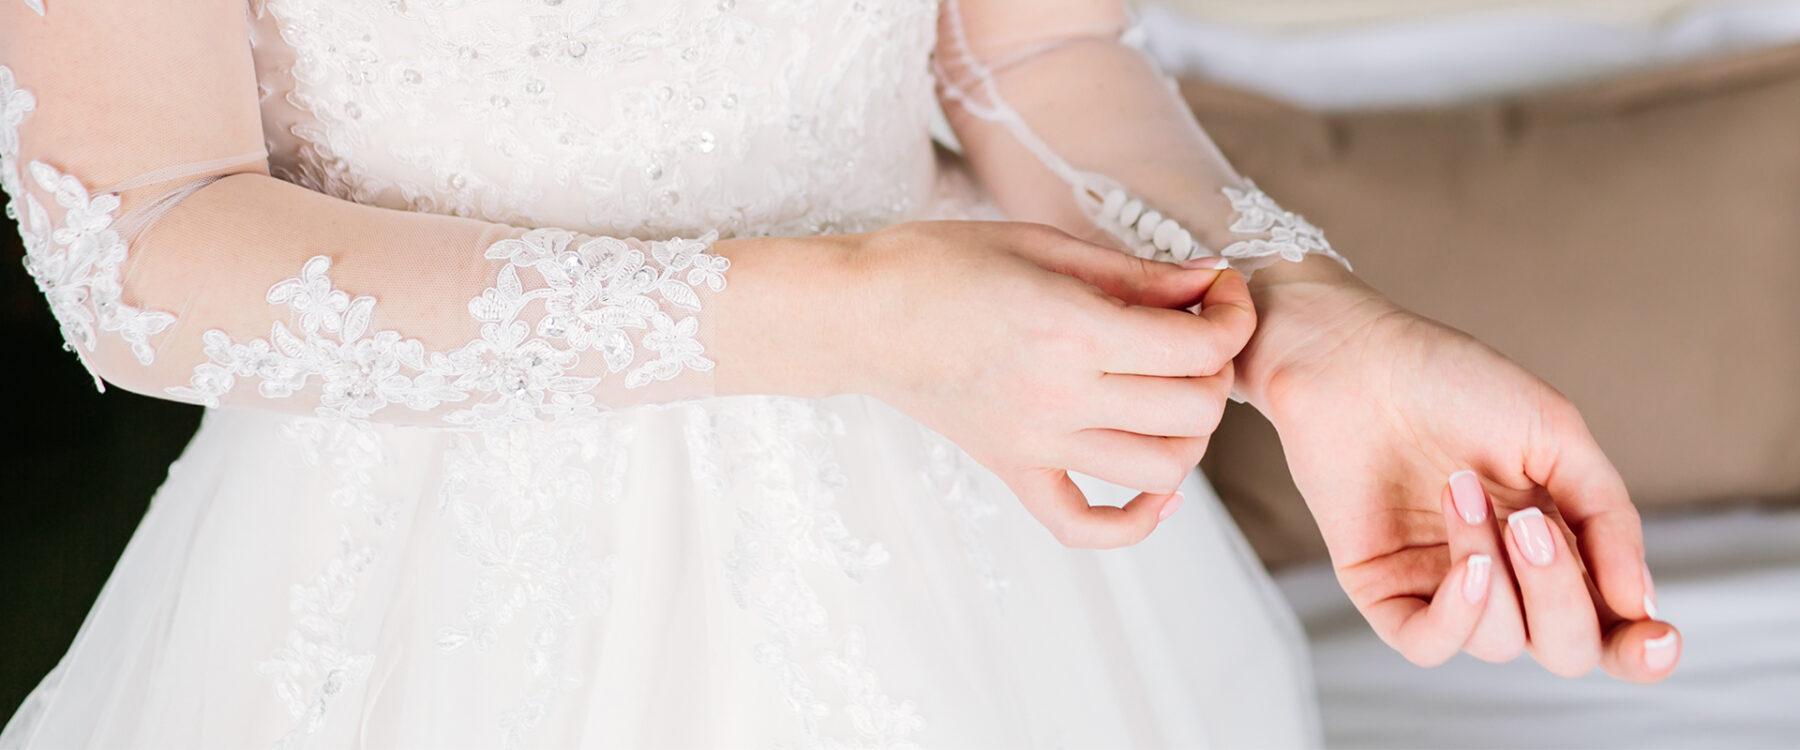 Bride Tugging on wedding dress sleeve